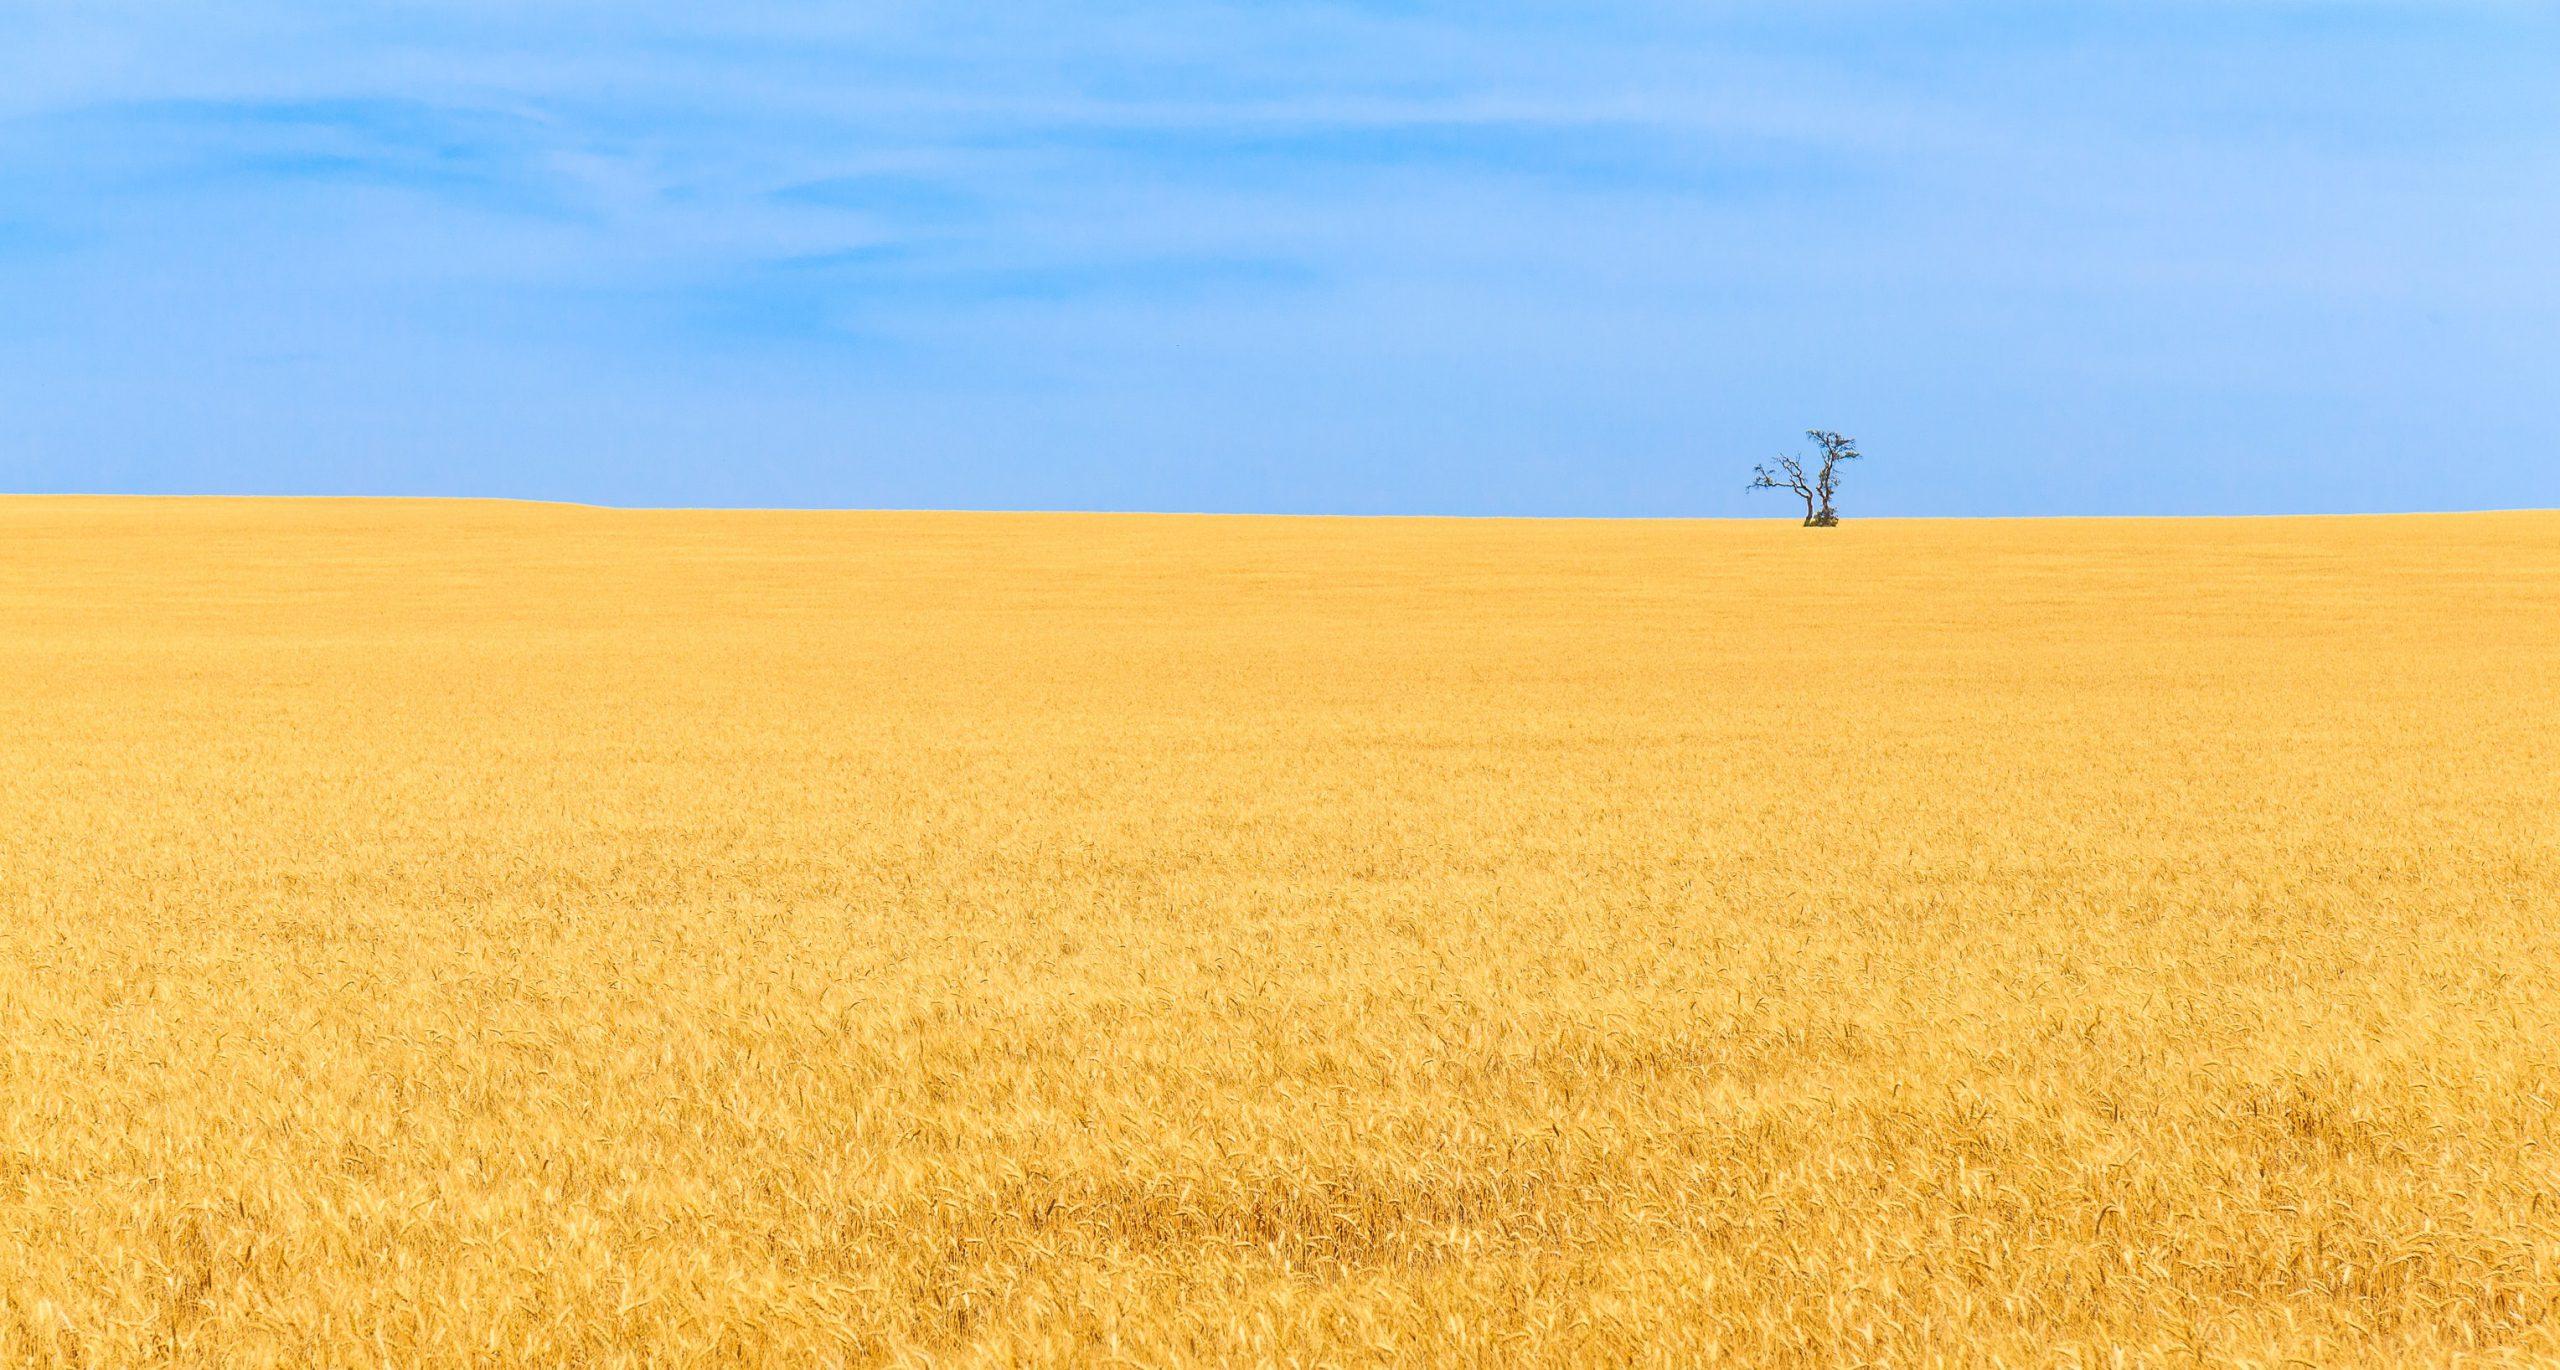 Riesiges Weizenfeld